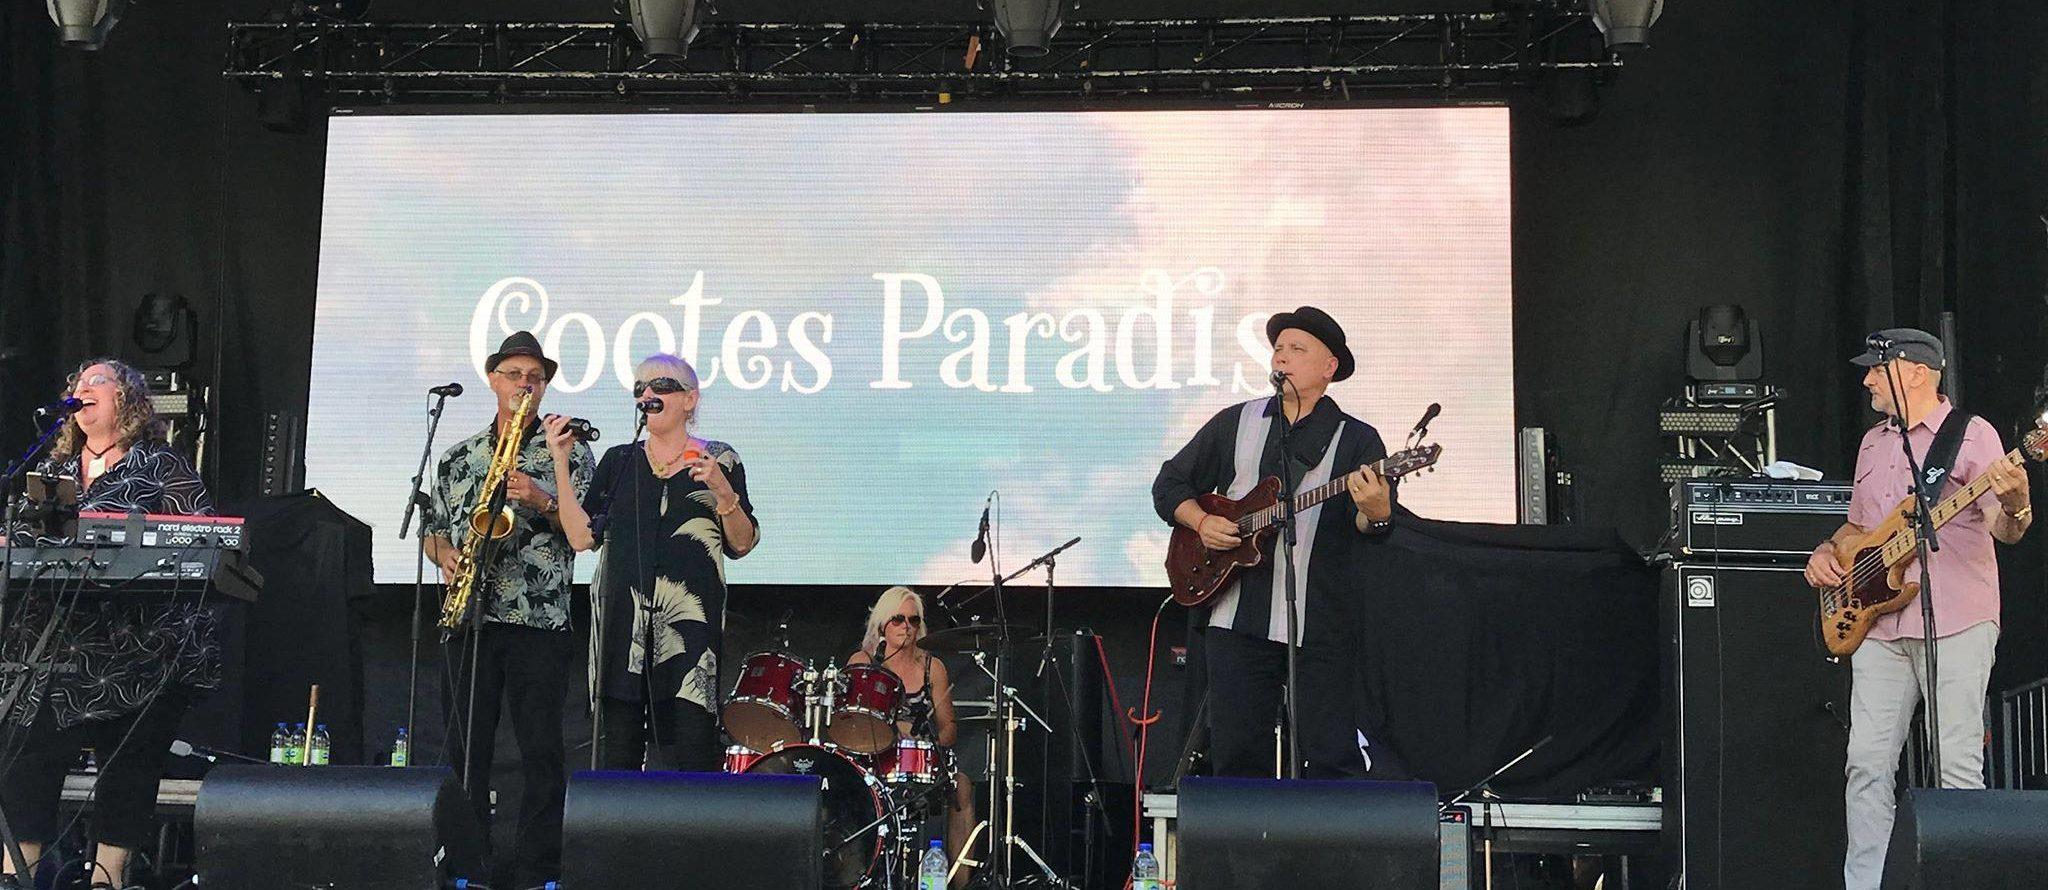 Cootes Paradise@Supercrawl